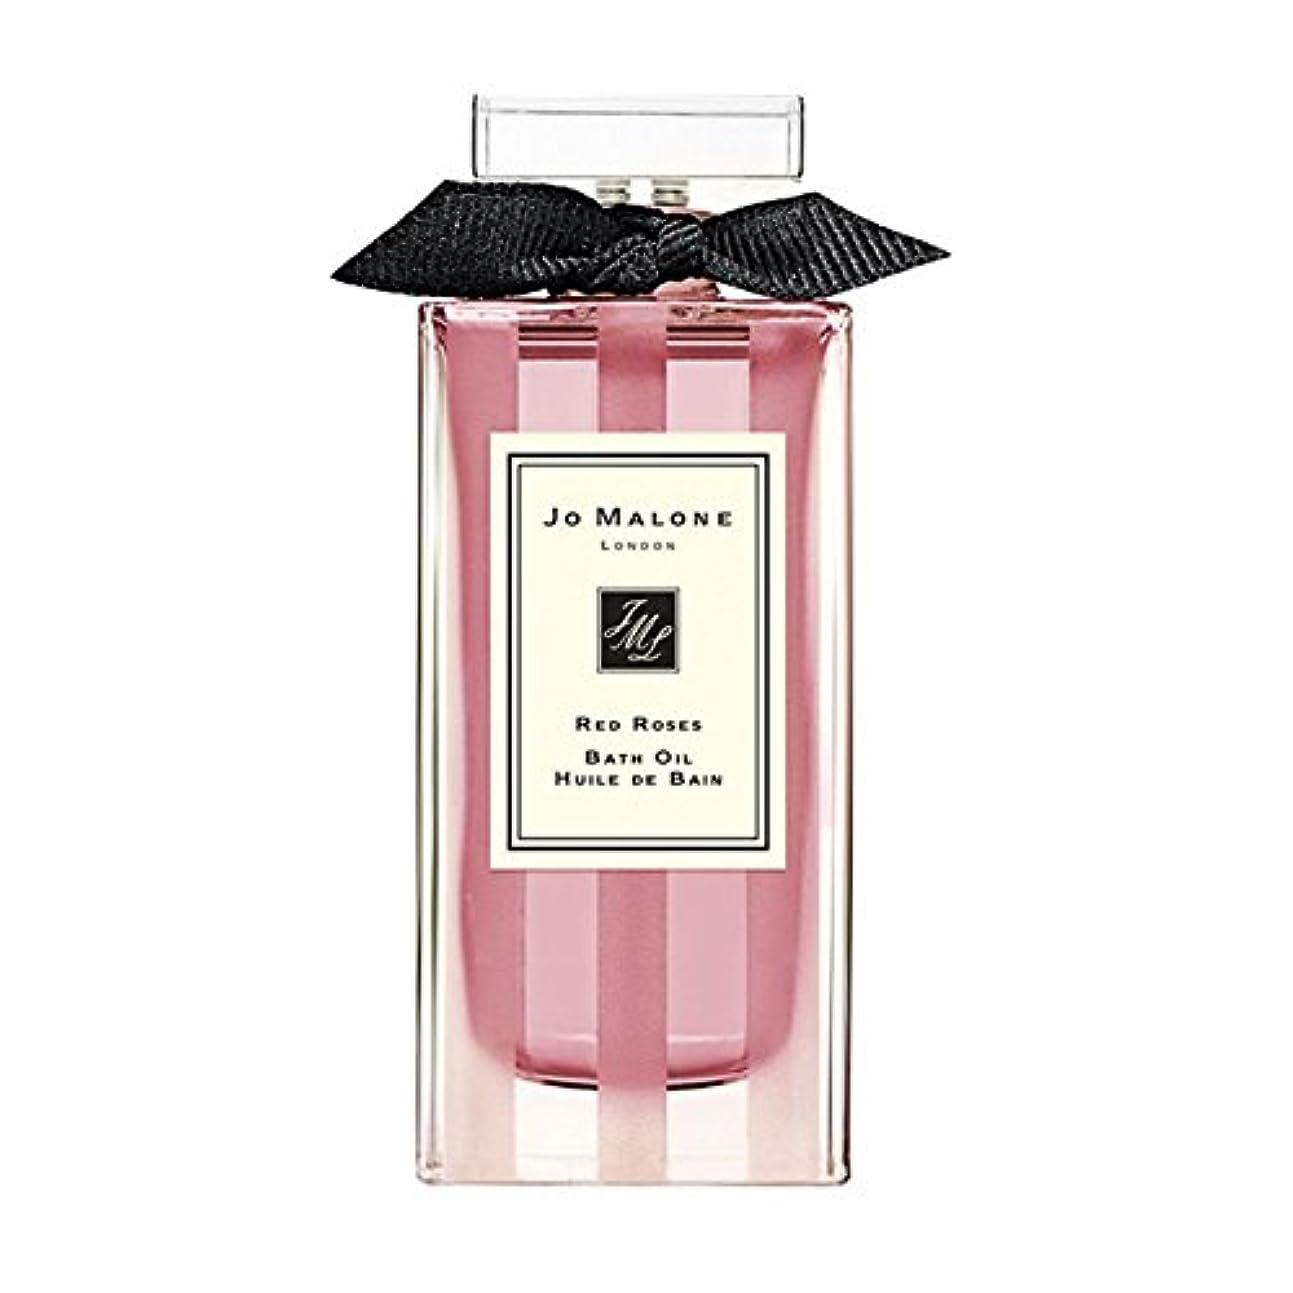 Jo Maloneジョーマローン, バスオイル - 赤いバラ (30ml)  'Red Roses' Bath Oil (1oz) [海外直送品] [並行輸入品]